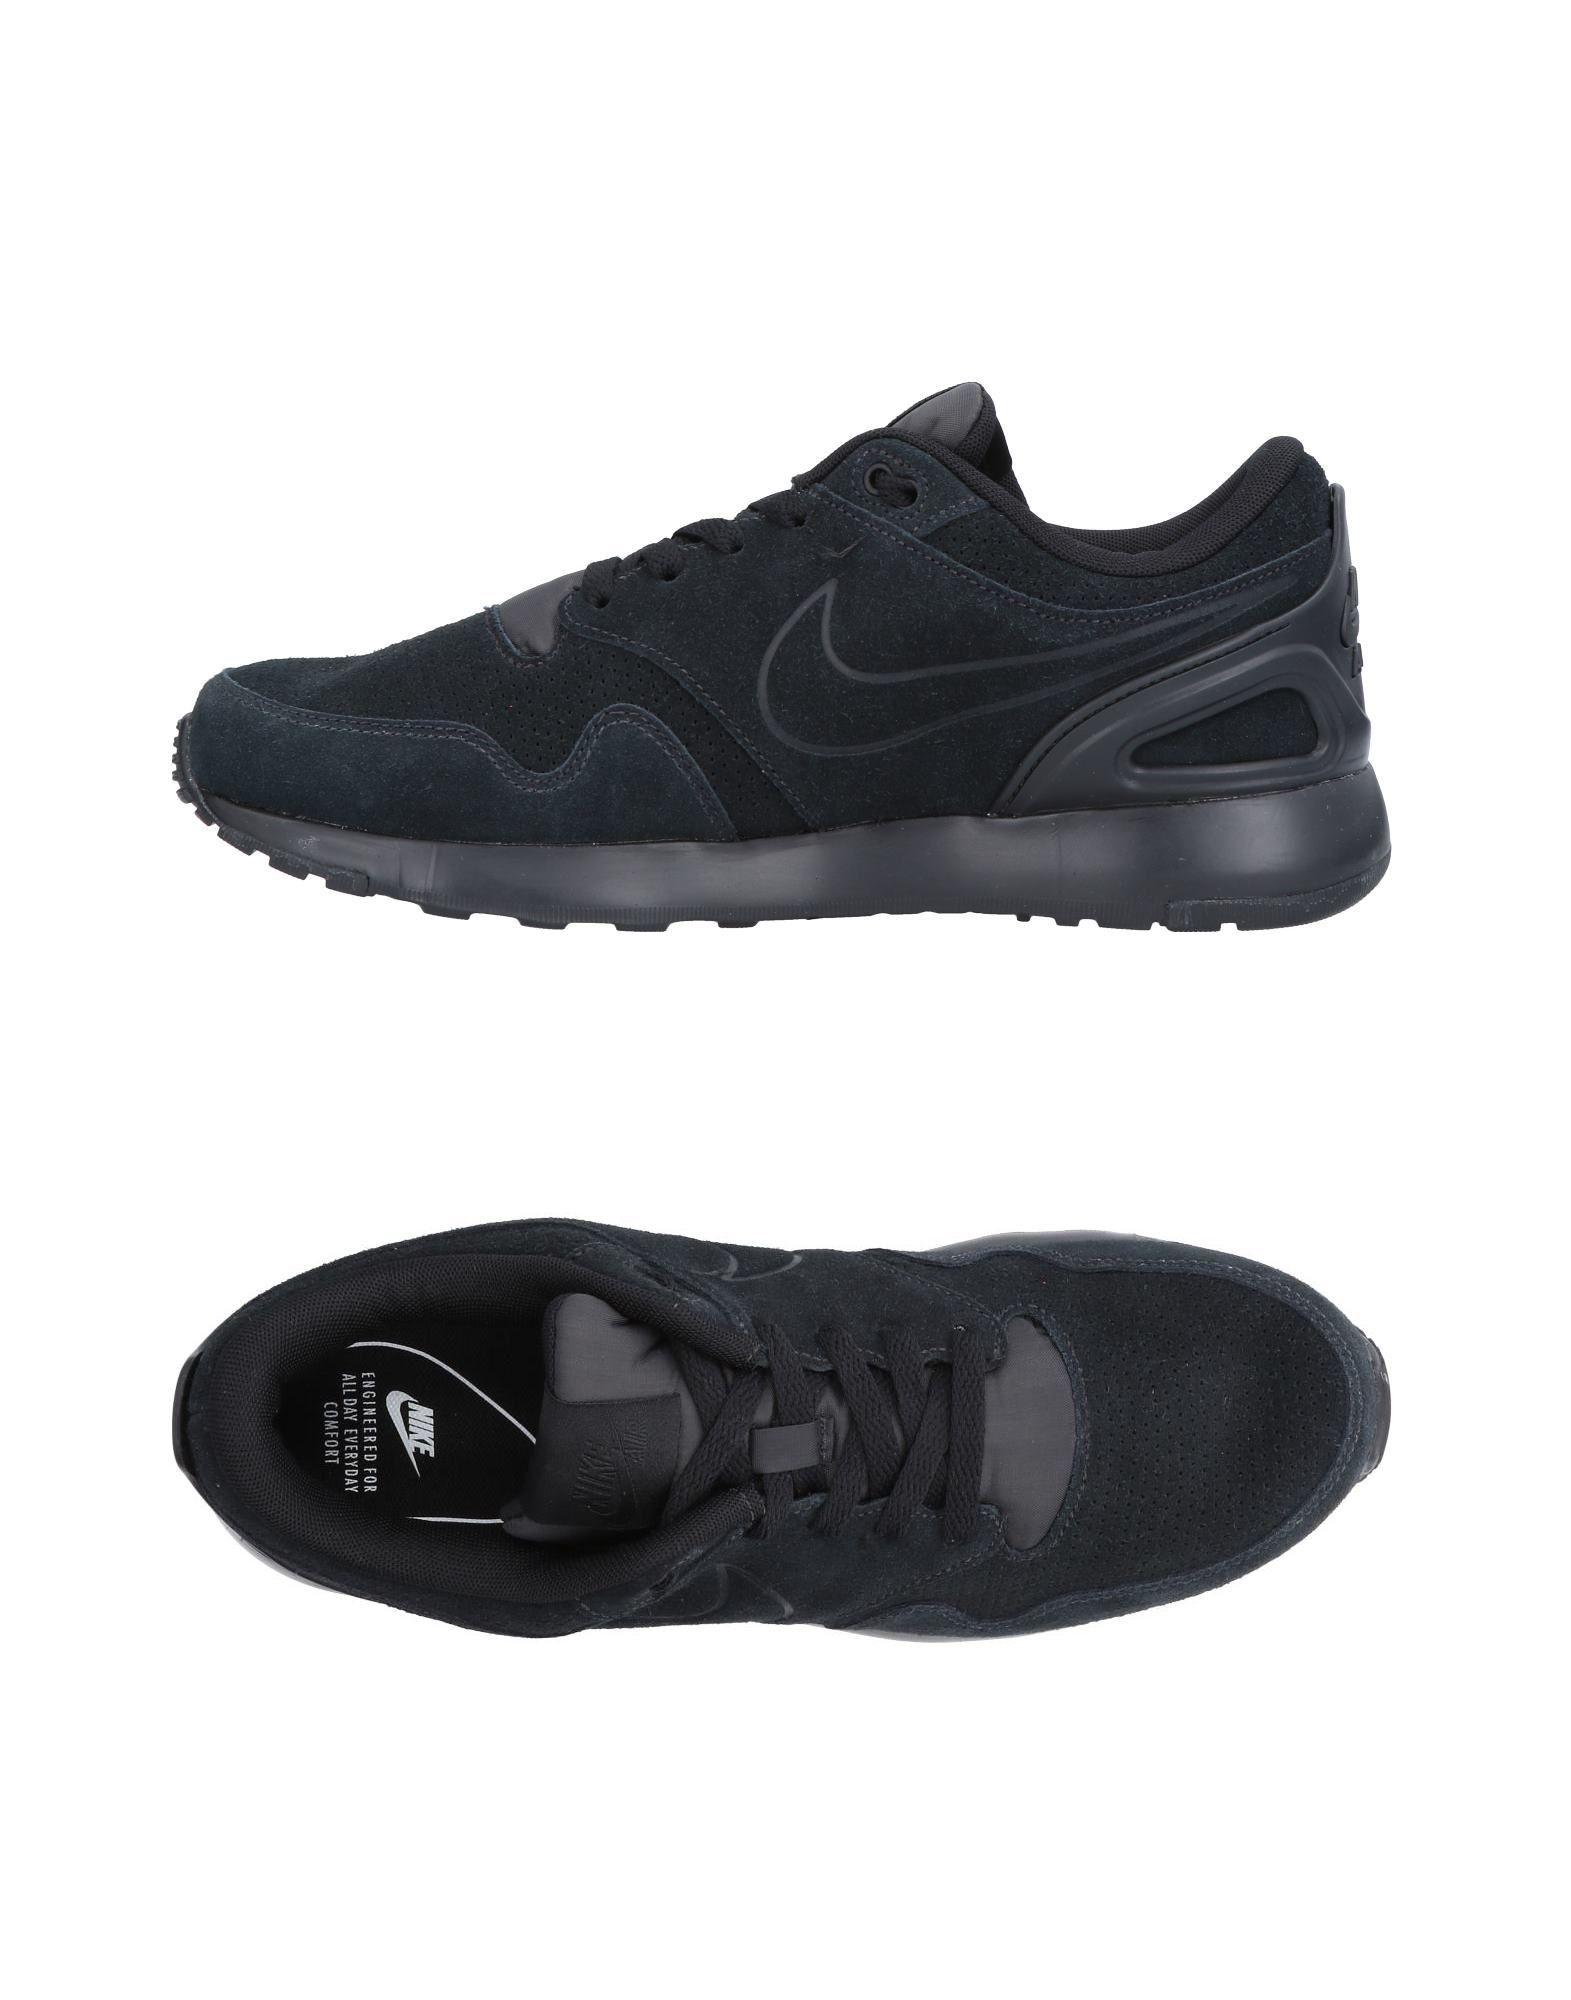 Sneakers Nike Uomo - 11494173VB elegante